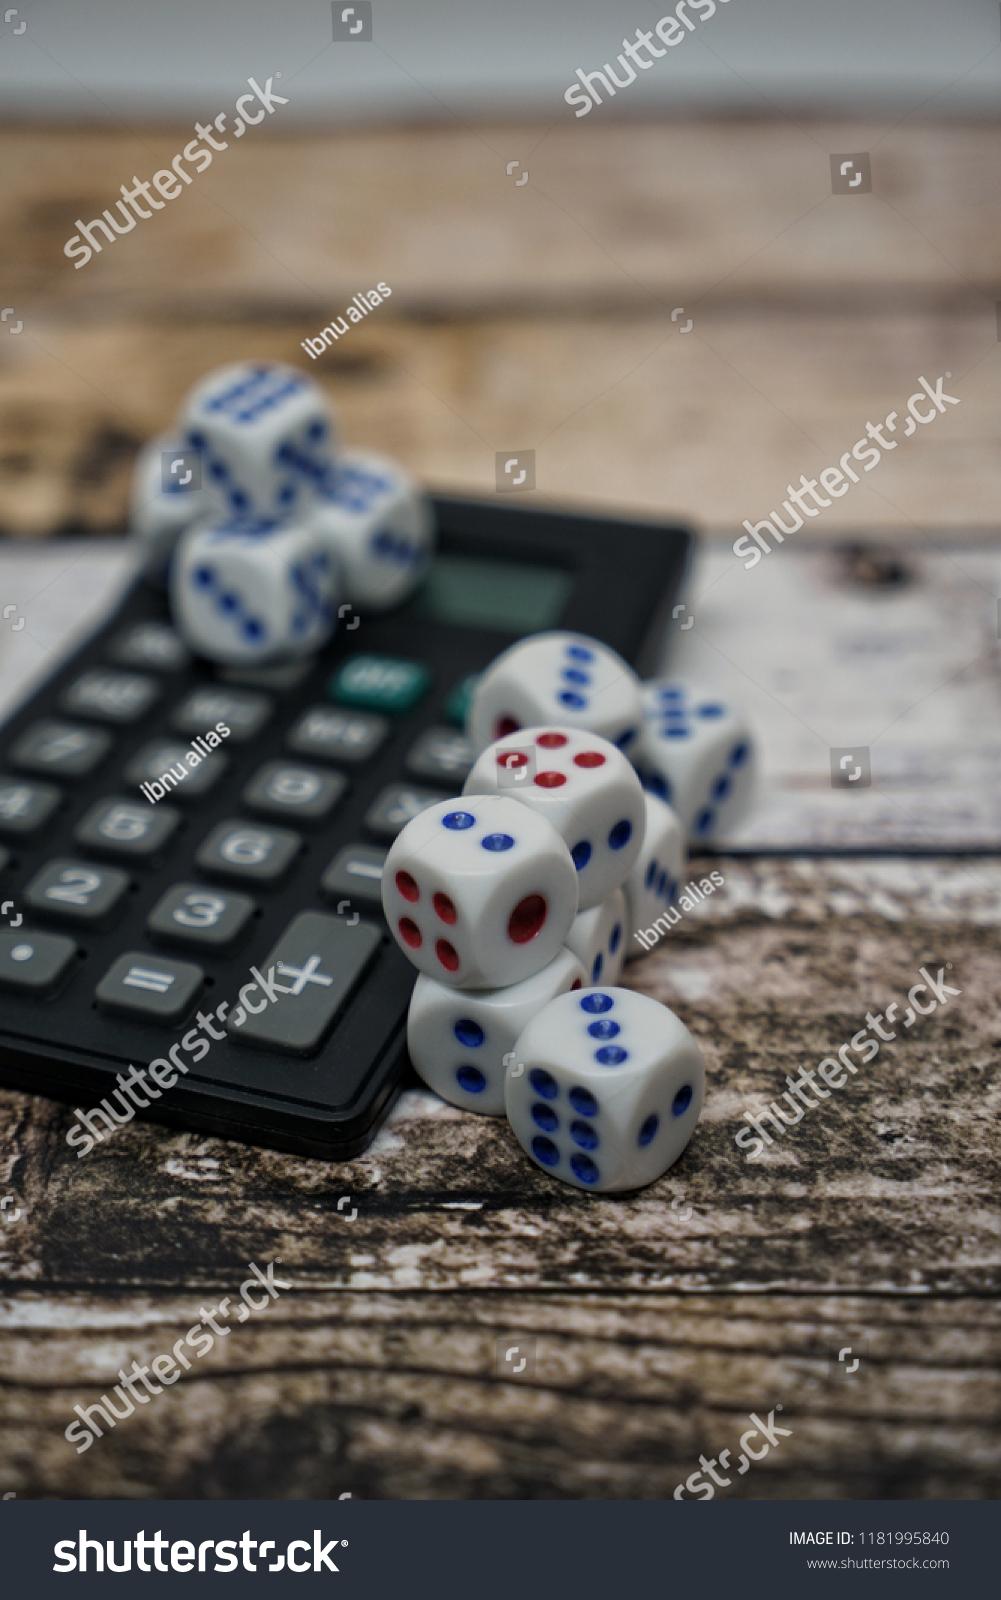 calculator risk gambling me near